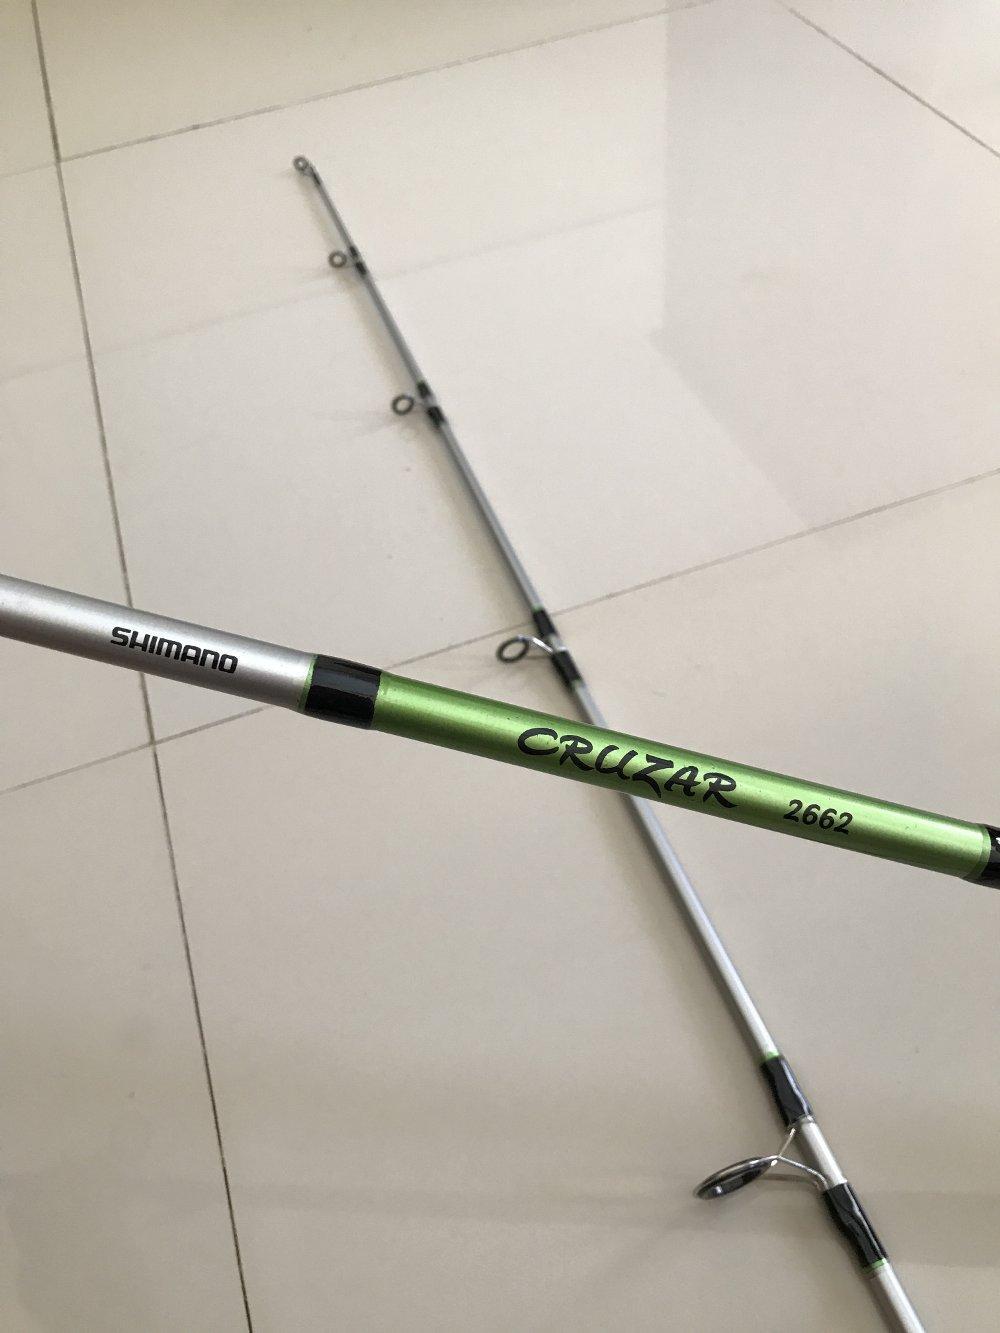 Joran Shimano Cruzar 662 198 Cm TERBARU BOS PANCING Zerya Fishing